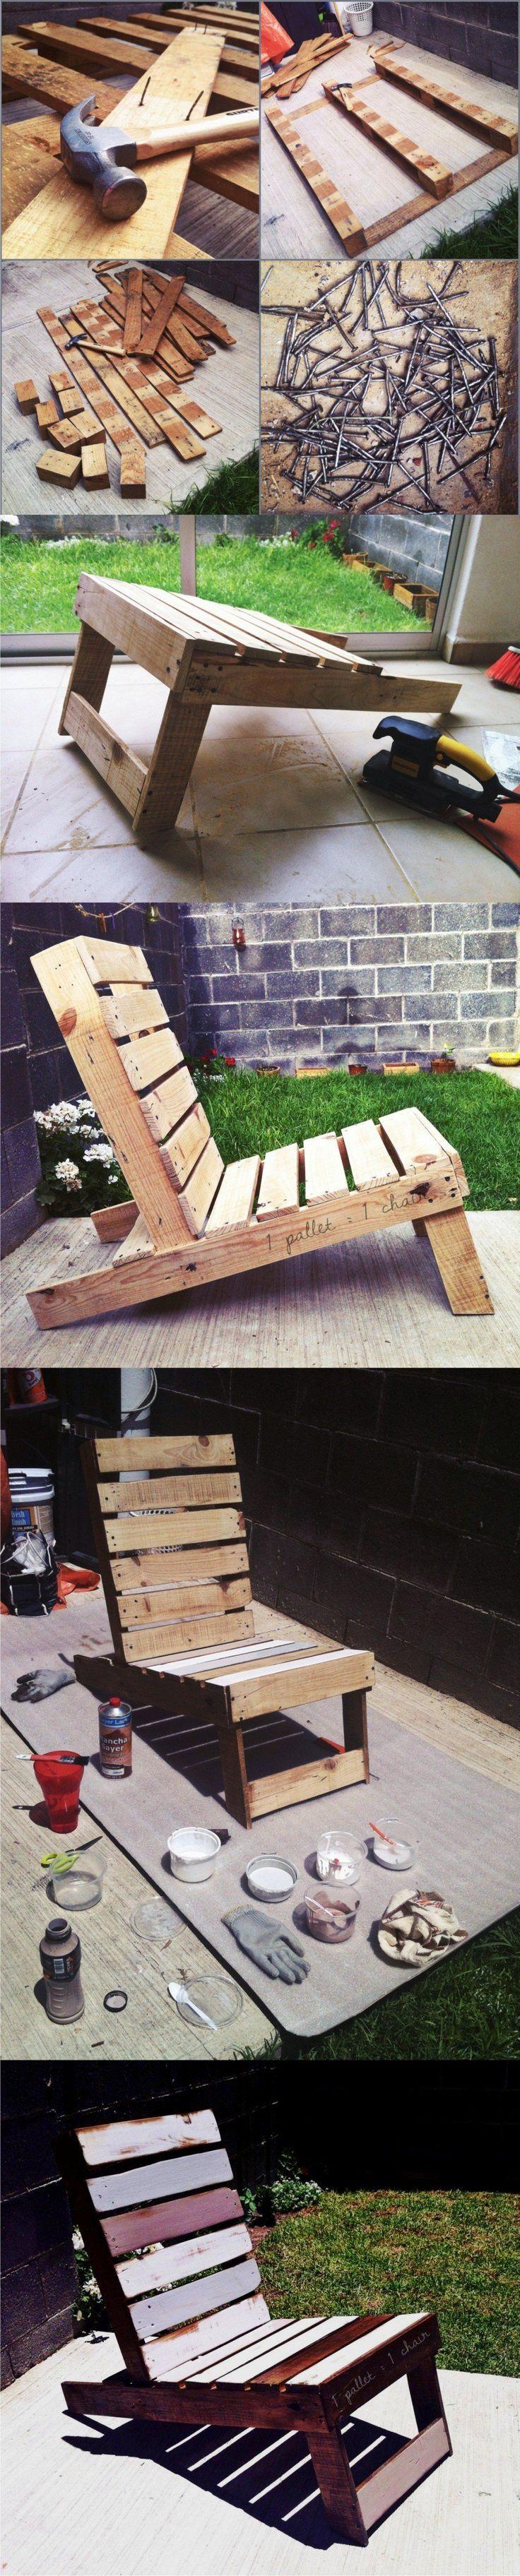 DIY Pallet Chair -madararube.wordpress.com - Silla DIY con un palé Grab your FREE Amazon Discount Finder Chrome Extension: http://youreallywantthis.com/FreeAmazonDiscountChromeExt